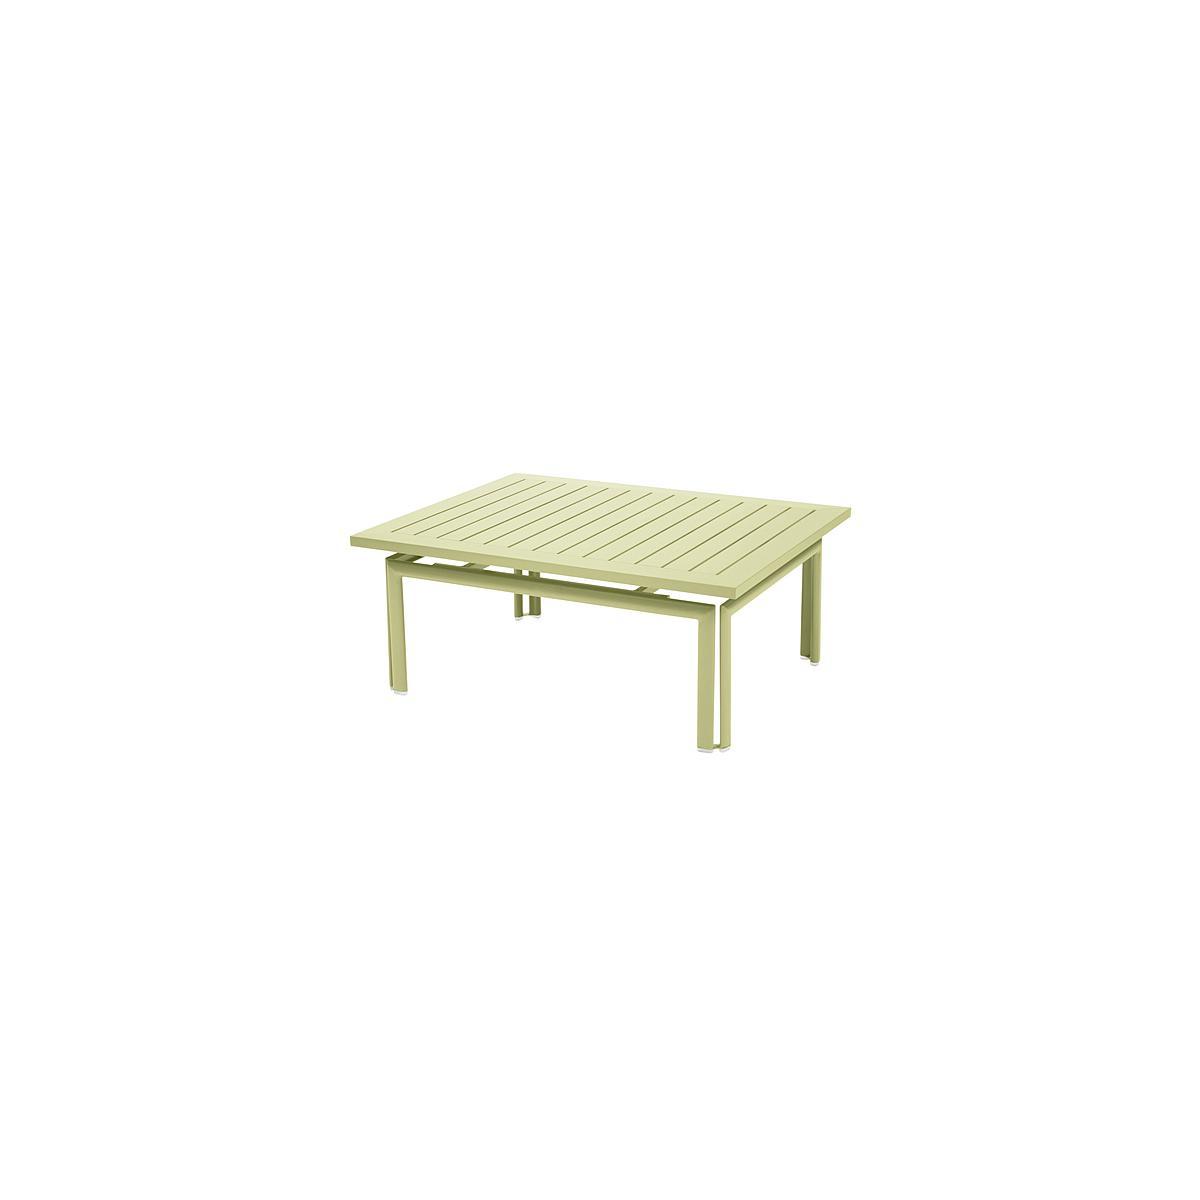 COSTA by Fermob Table basse Vert tilleul